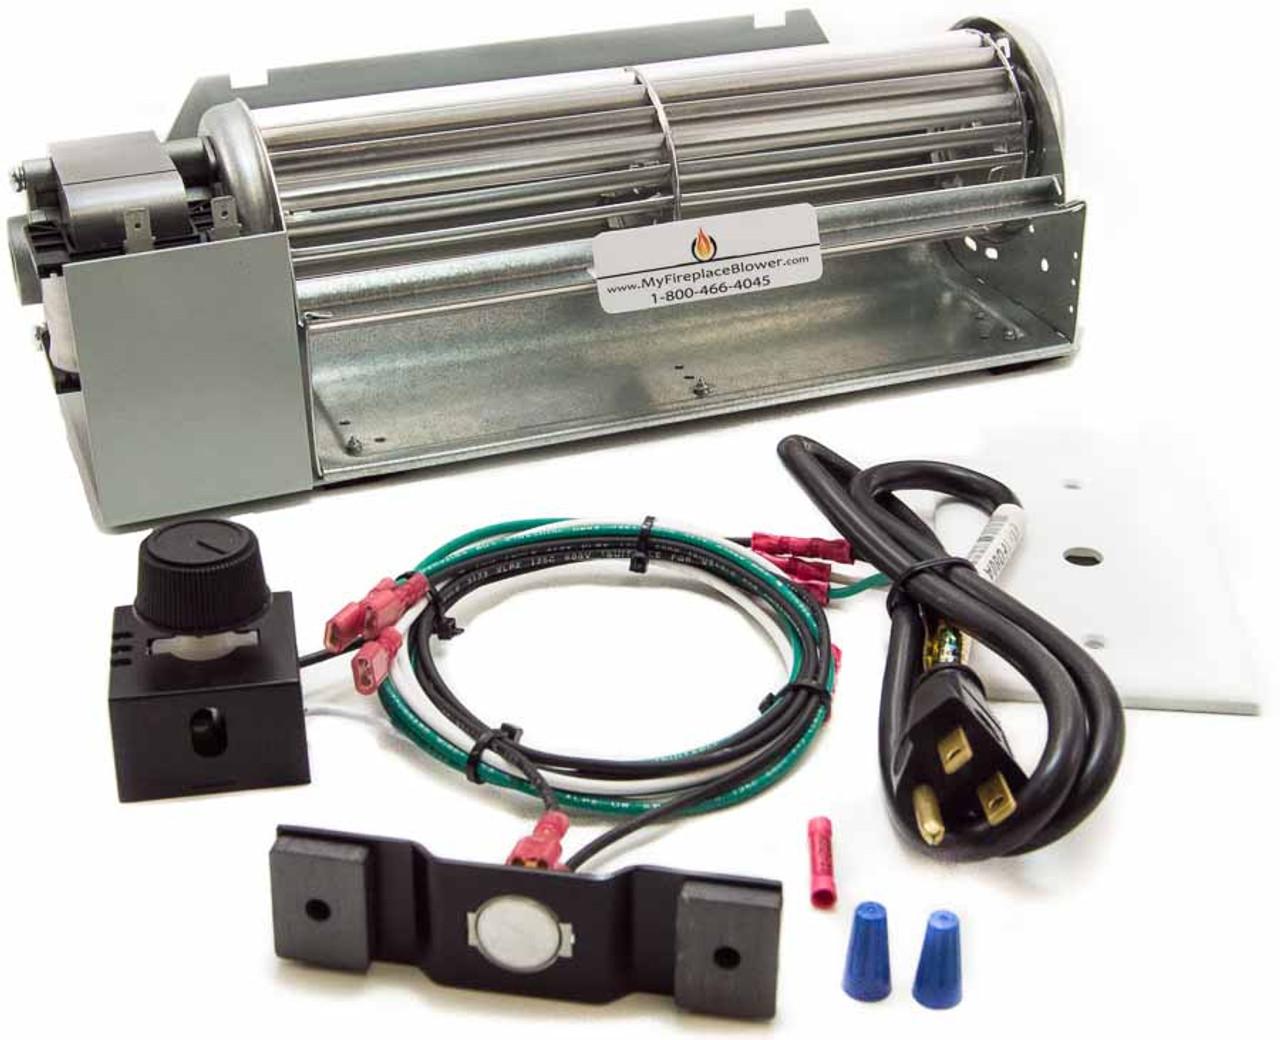 Diagram Fan Wiring Motor Fbk 250 - Wiring Diagram & Cable ... on